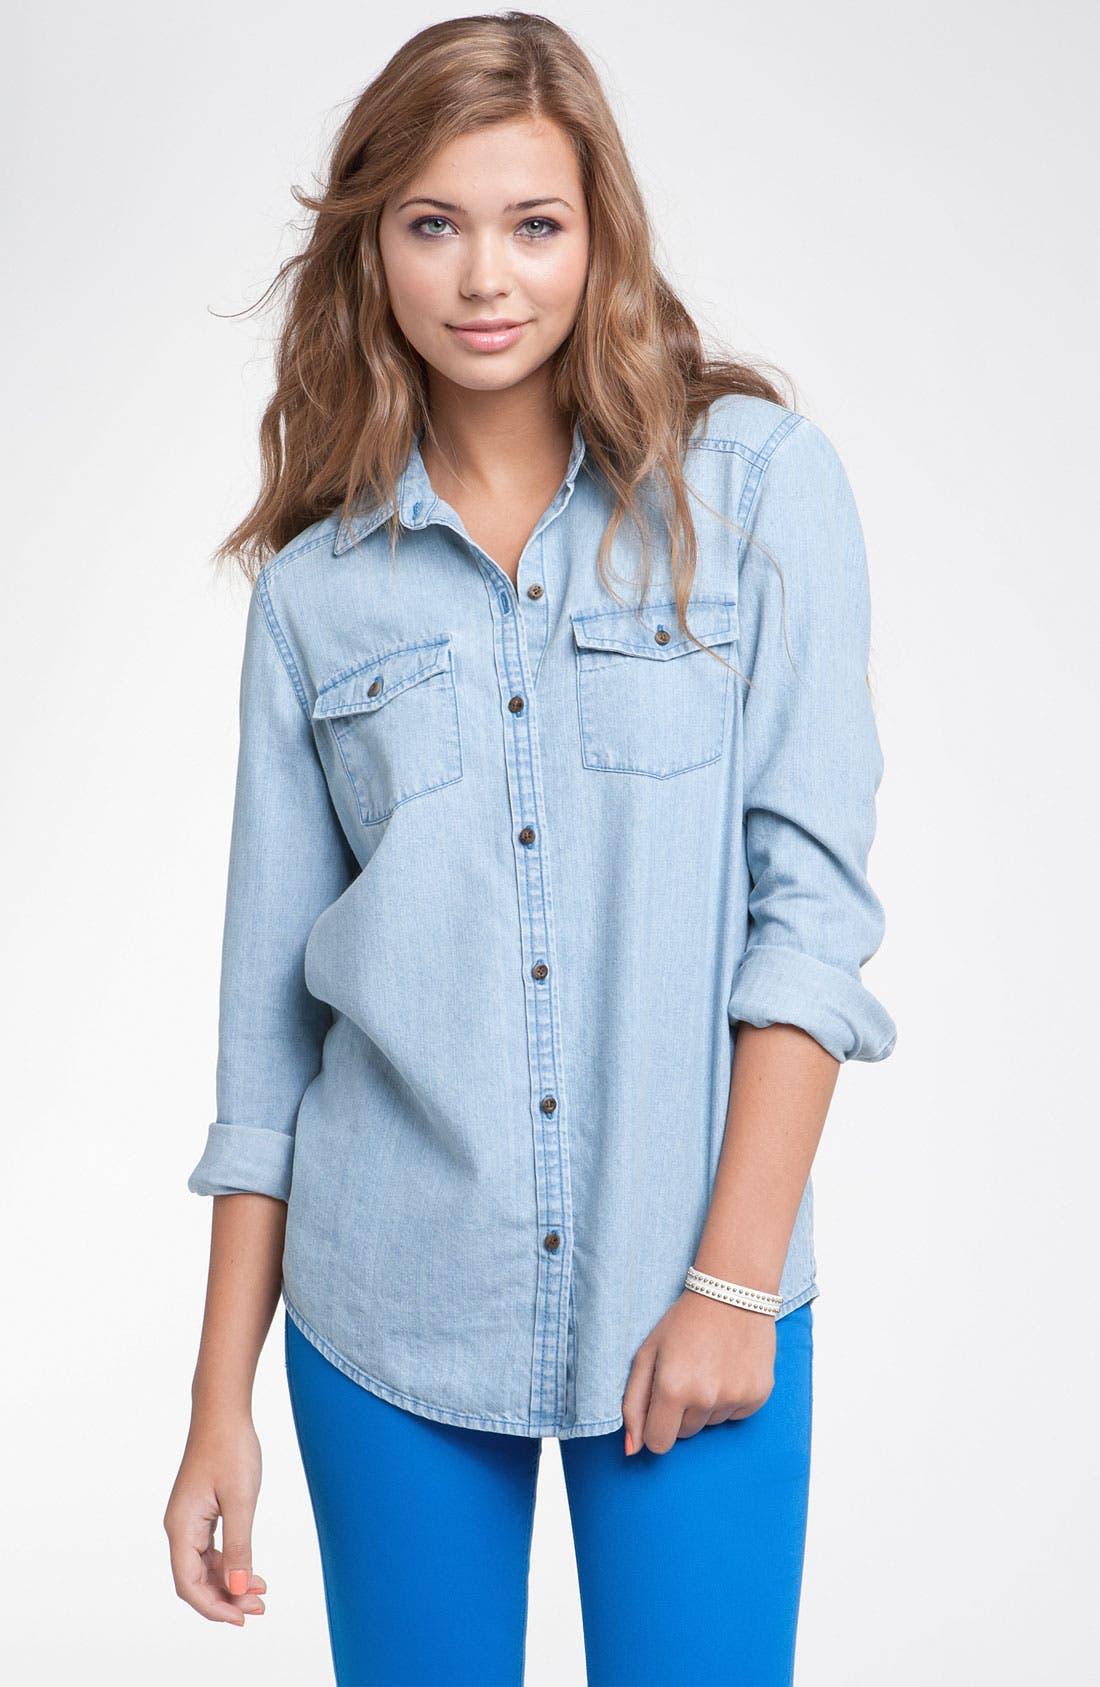 Alternate Image 1 Selected - Rubbish® Chambray Shirt (Juniors)